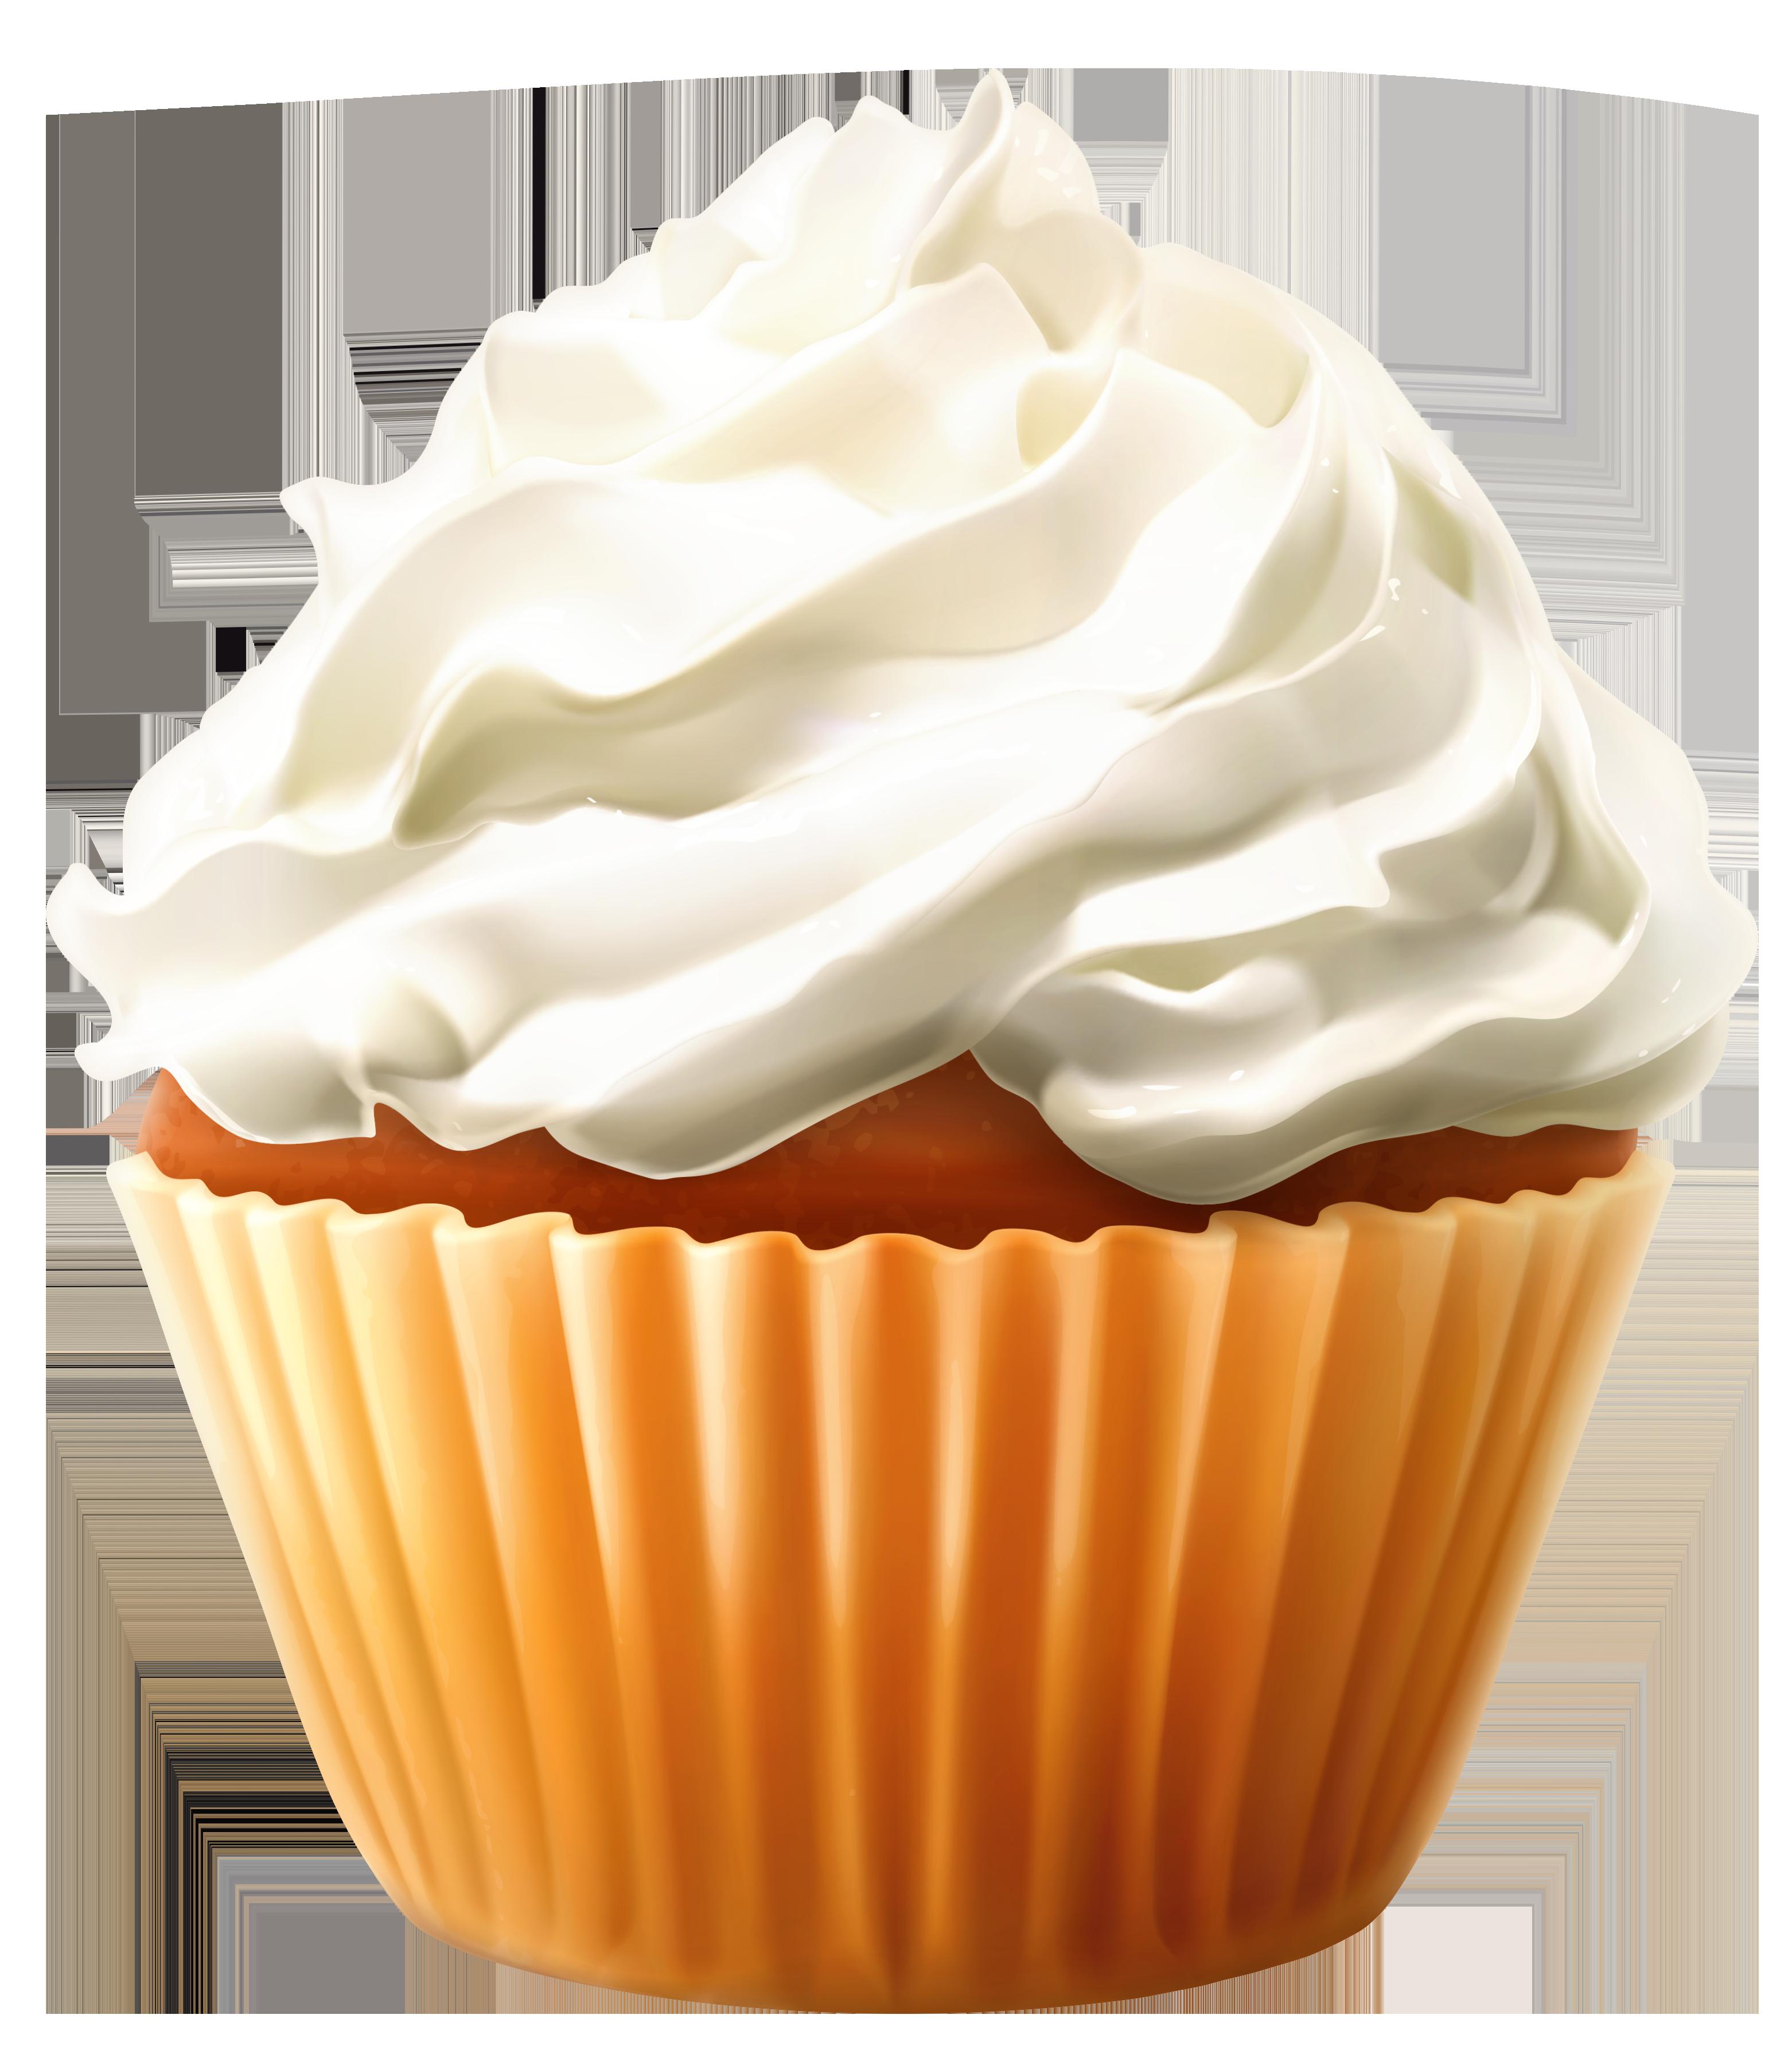 Whip clipart clip art. Mini cake with cream